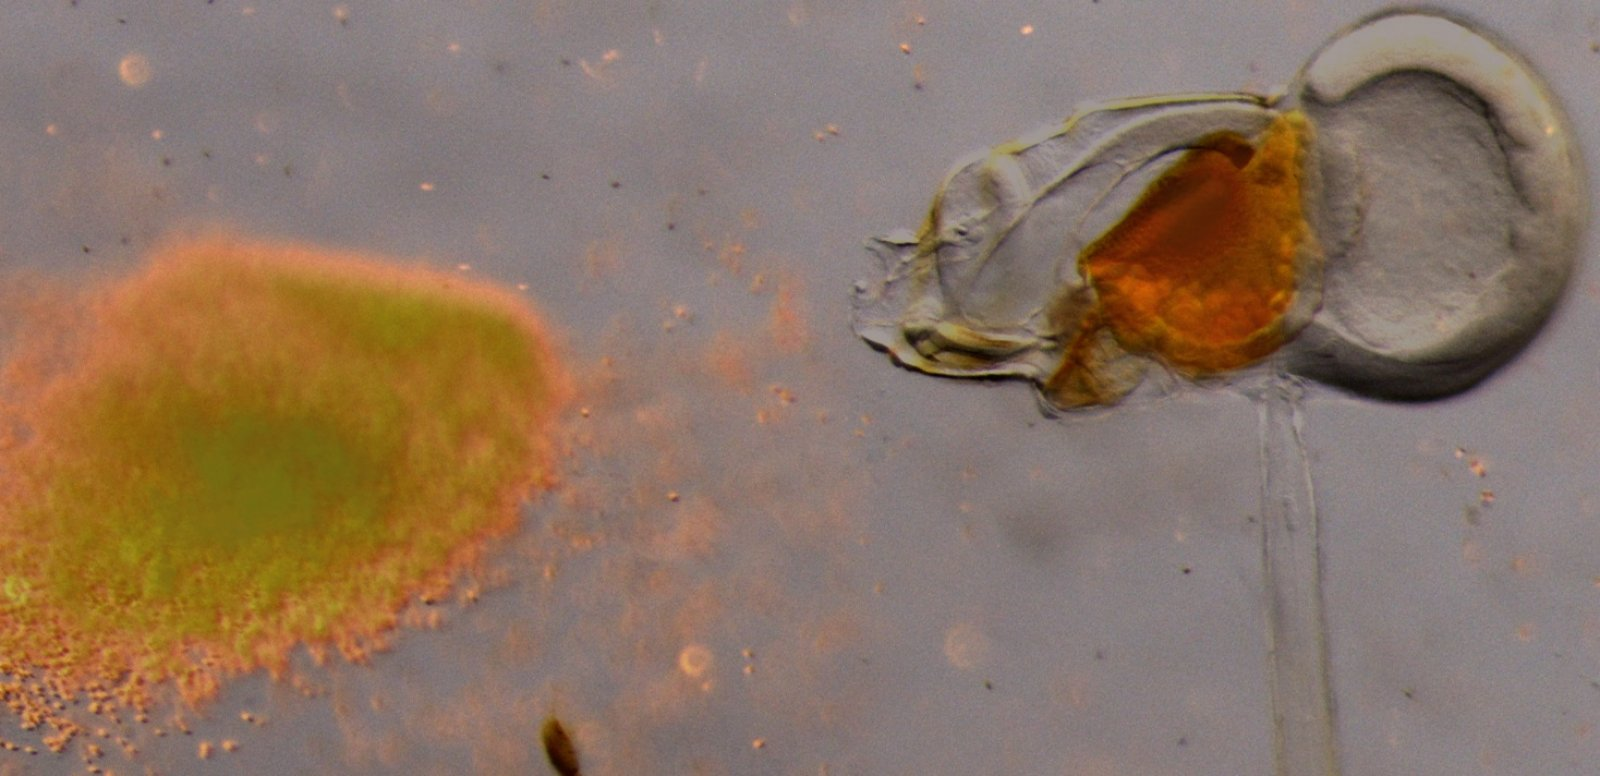 Una alga oikopleura alimentant-se